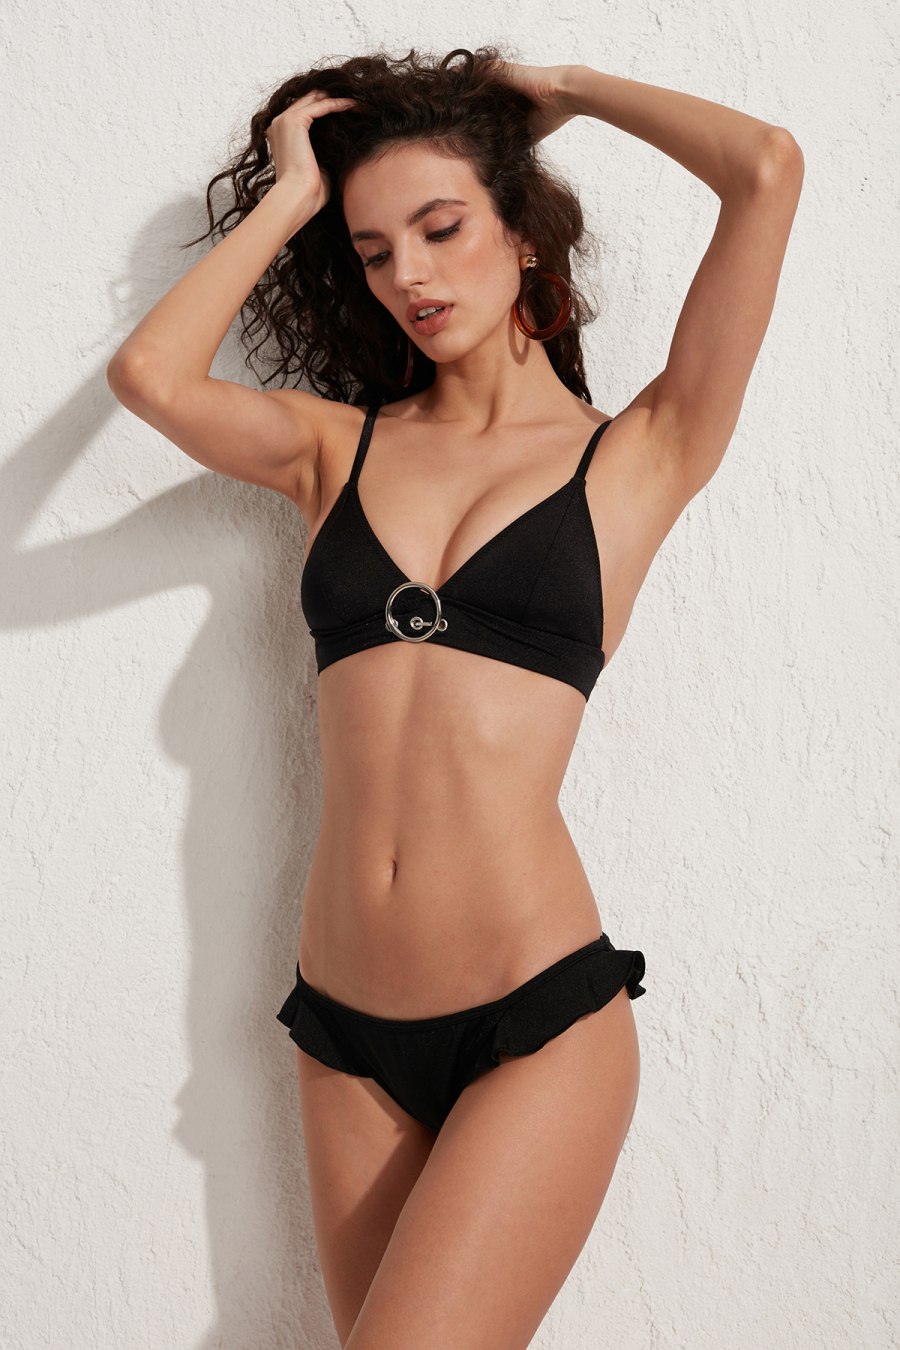 Rock Siyah Üçgen Bikini Üstü LM18113 Black